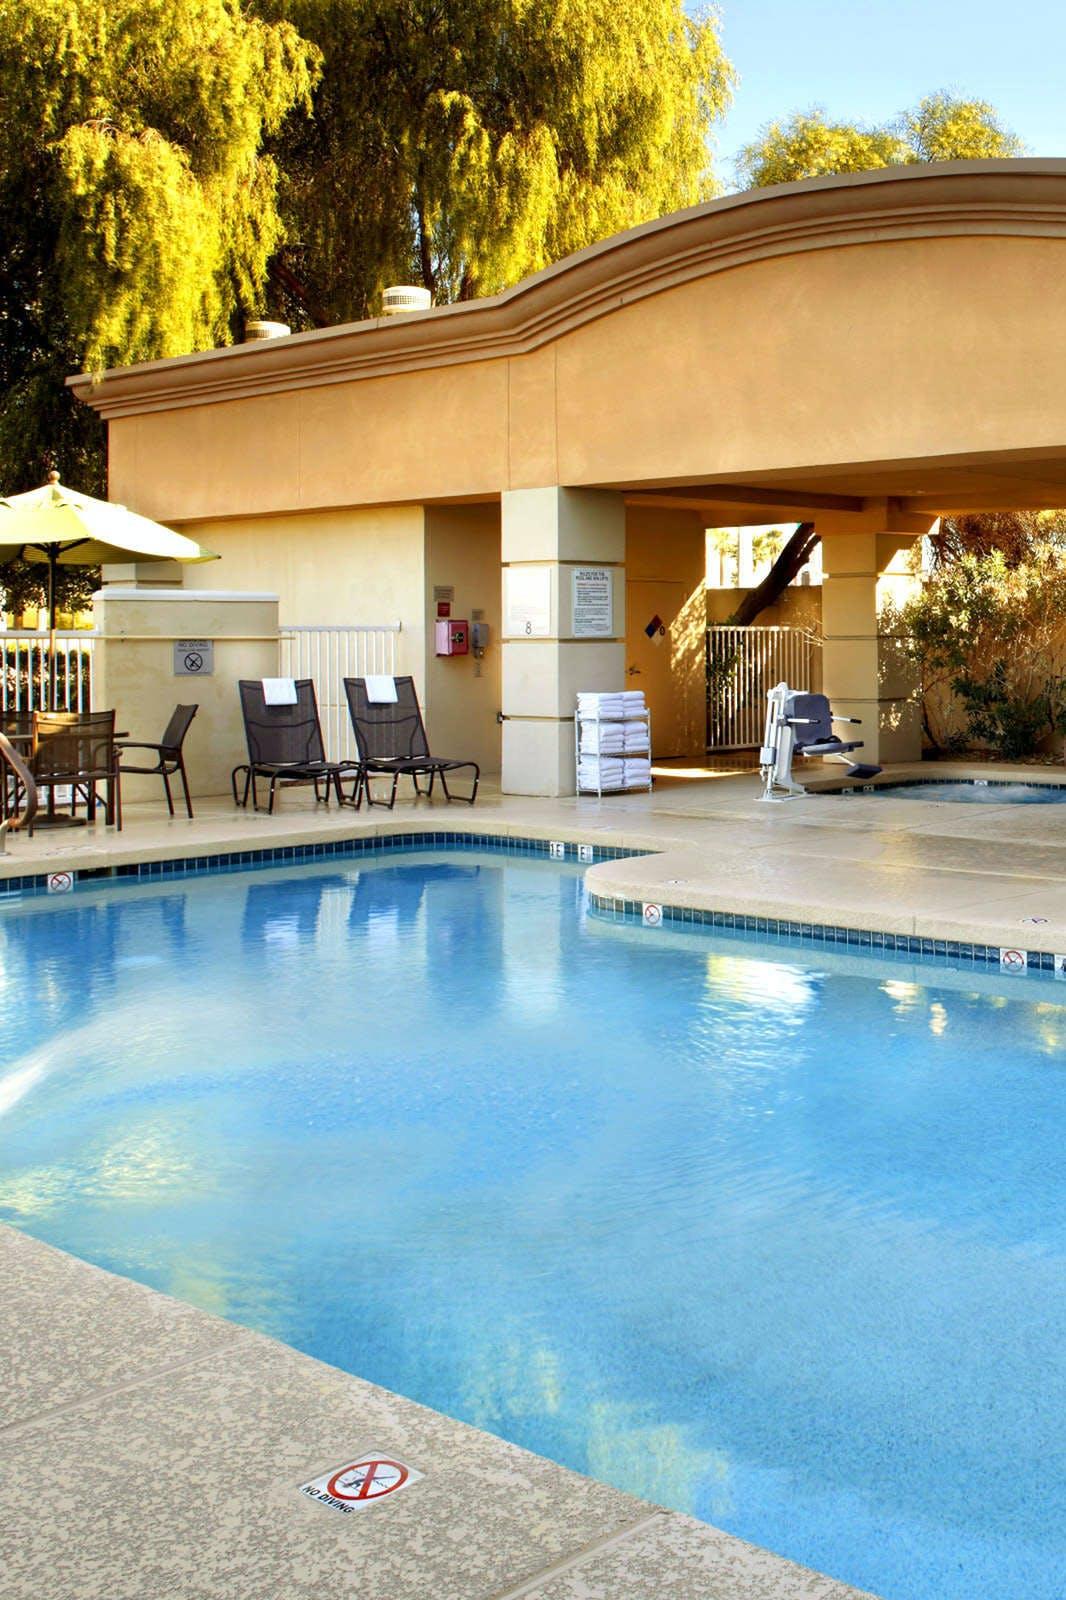 Fairfield Inn & Suites Phoenix Midtown